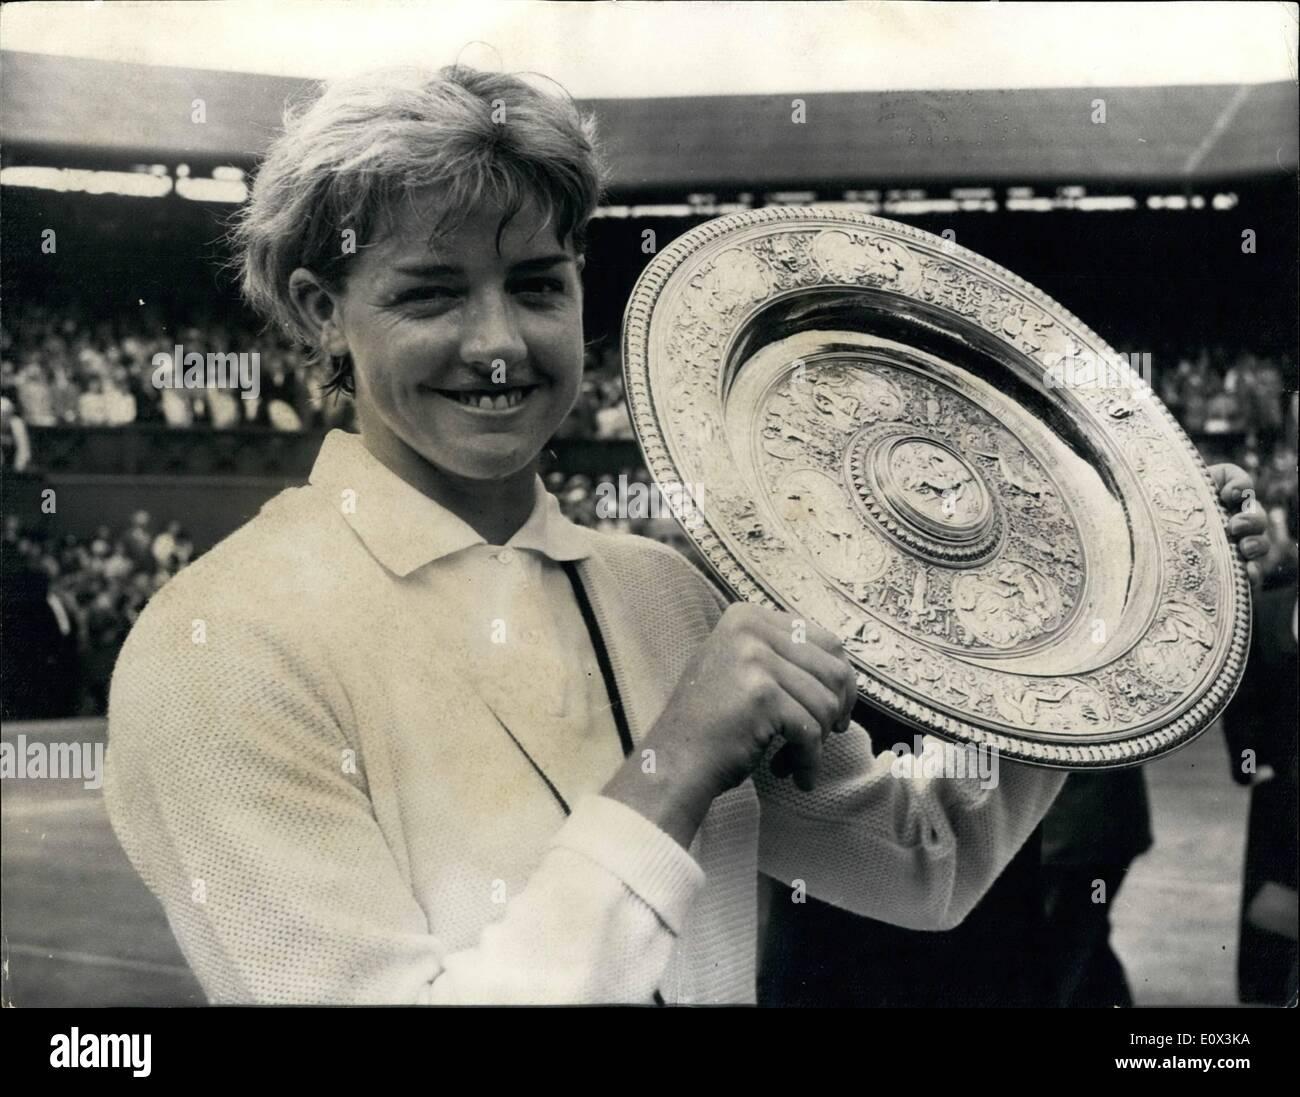 Mar 03 1965 MARGARET SMITH WINS WIMBLEDON CHAMPIONSHIP BEATING